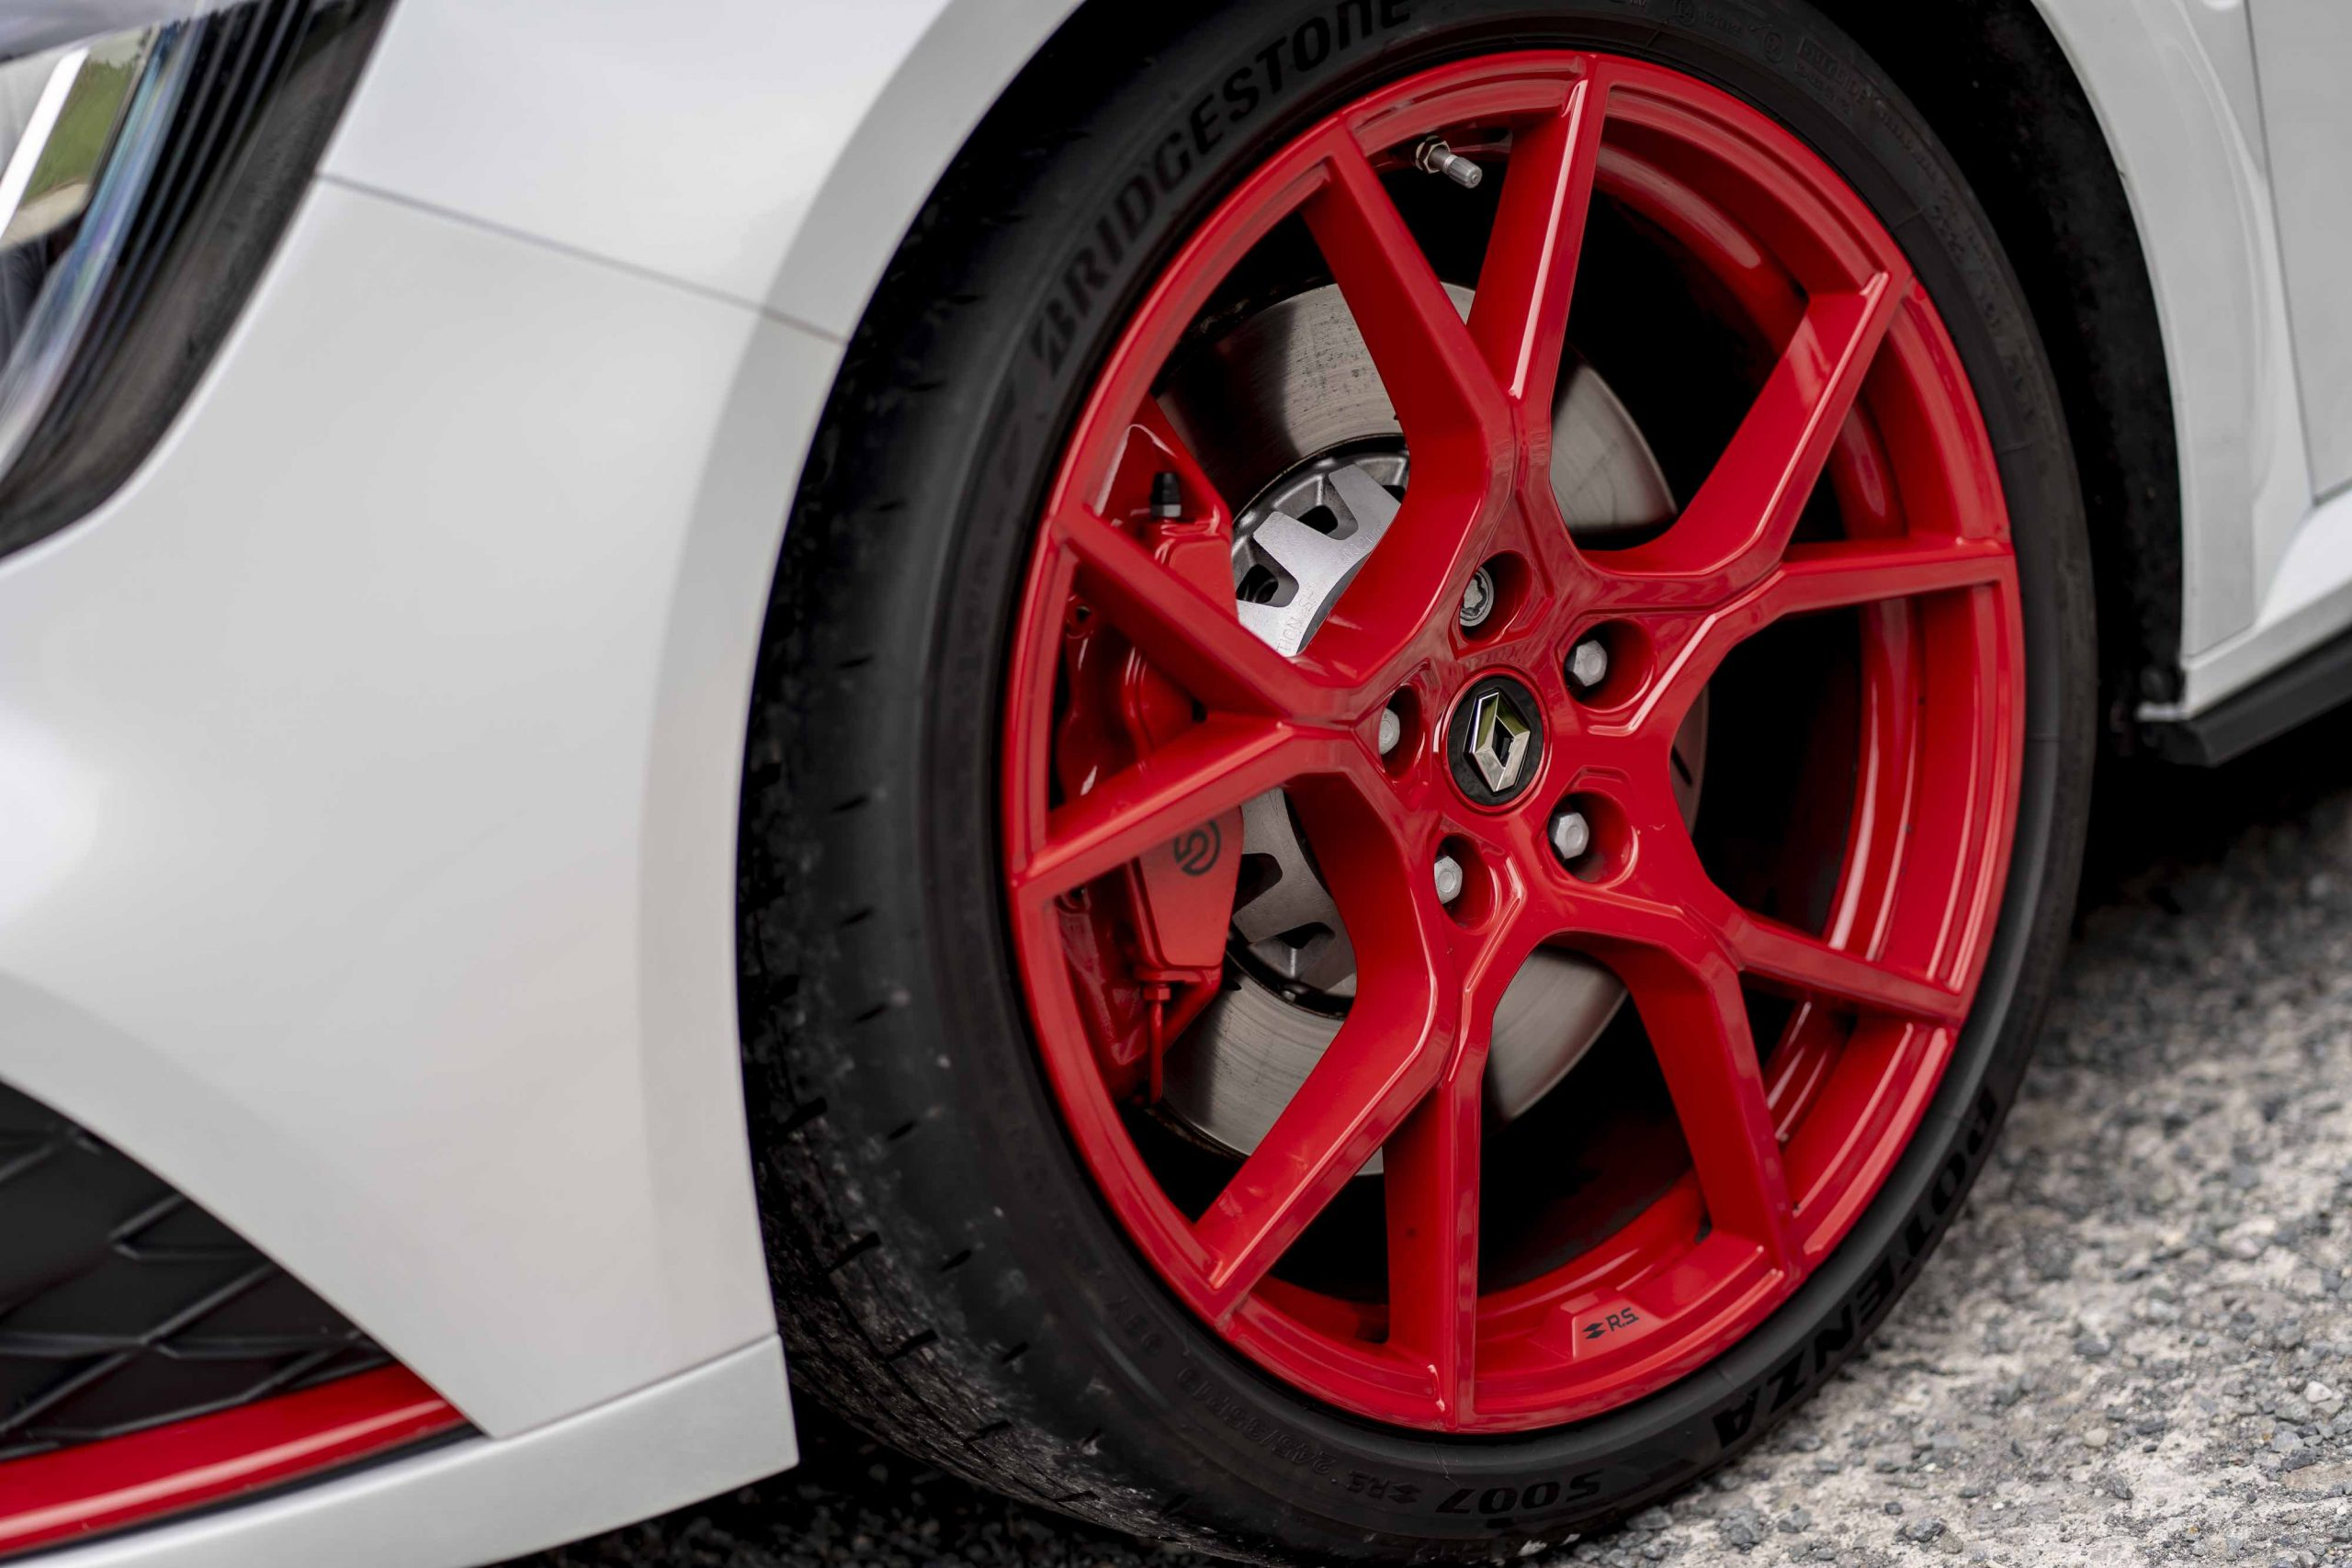 renault megane trophy r wheel detail